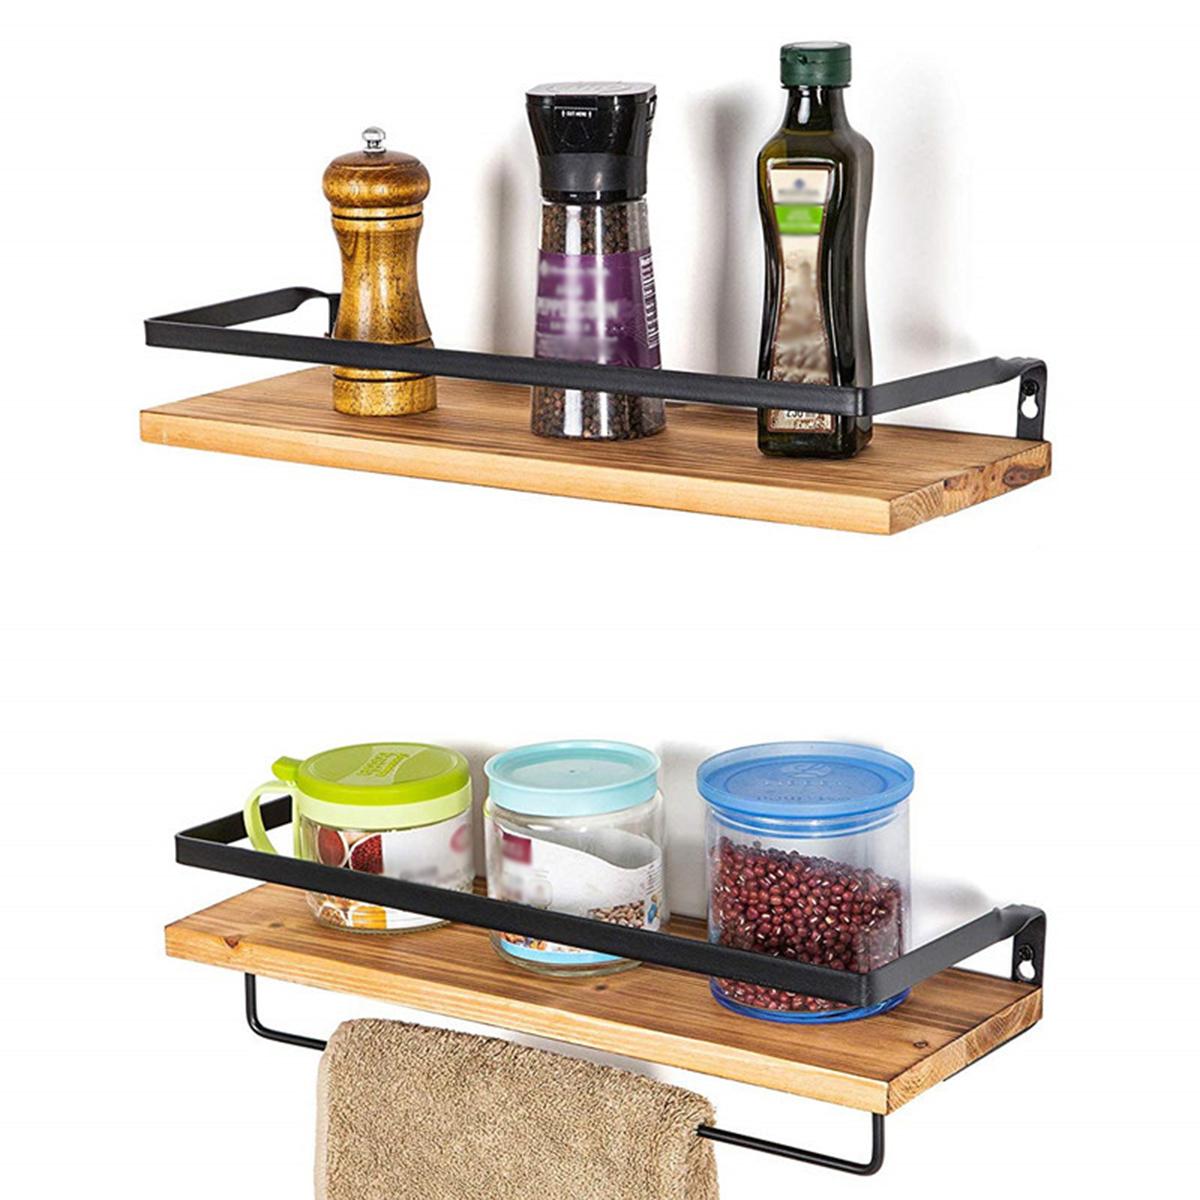 2x Metal Rustic Wooden Wall Shelf Shelves Mounted Storage Decor Kitchen Bathroom Ebay